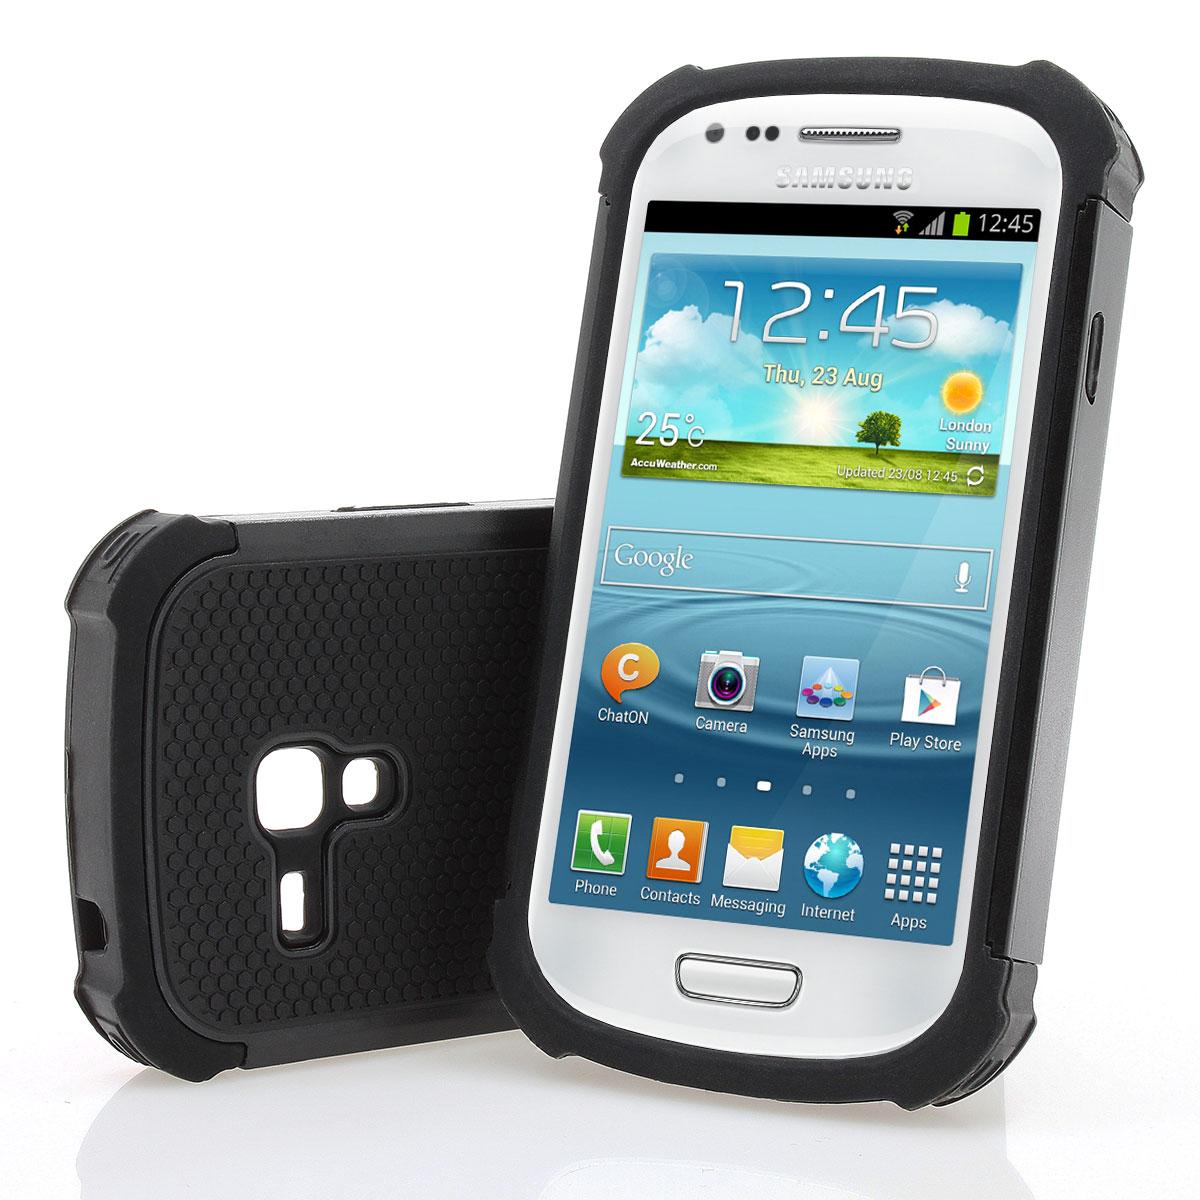 samsung galaxy s3 mini i8190 outdoor silikon h lle case. Black Bedroom Furniture Sets. Home Design Ideas